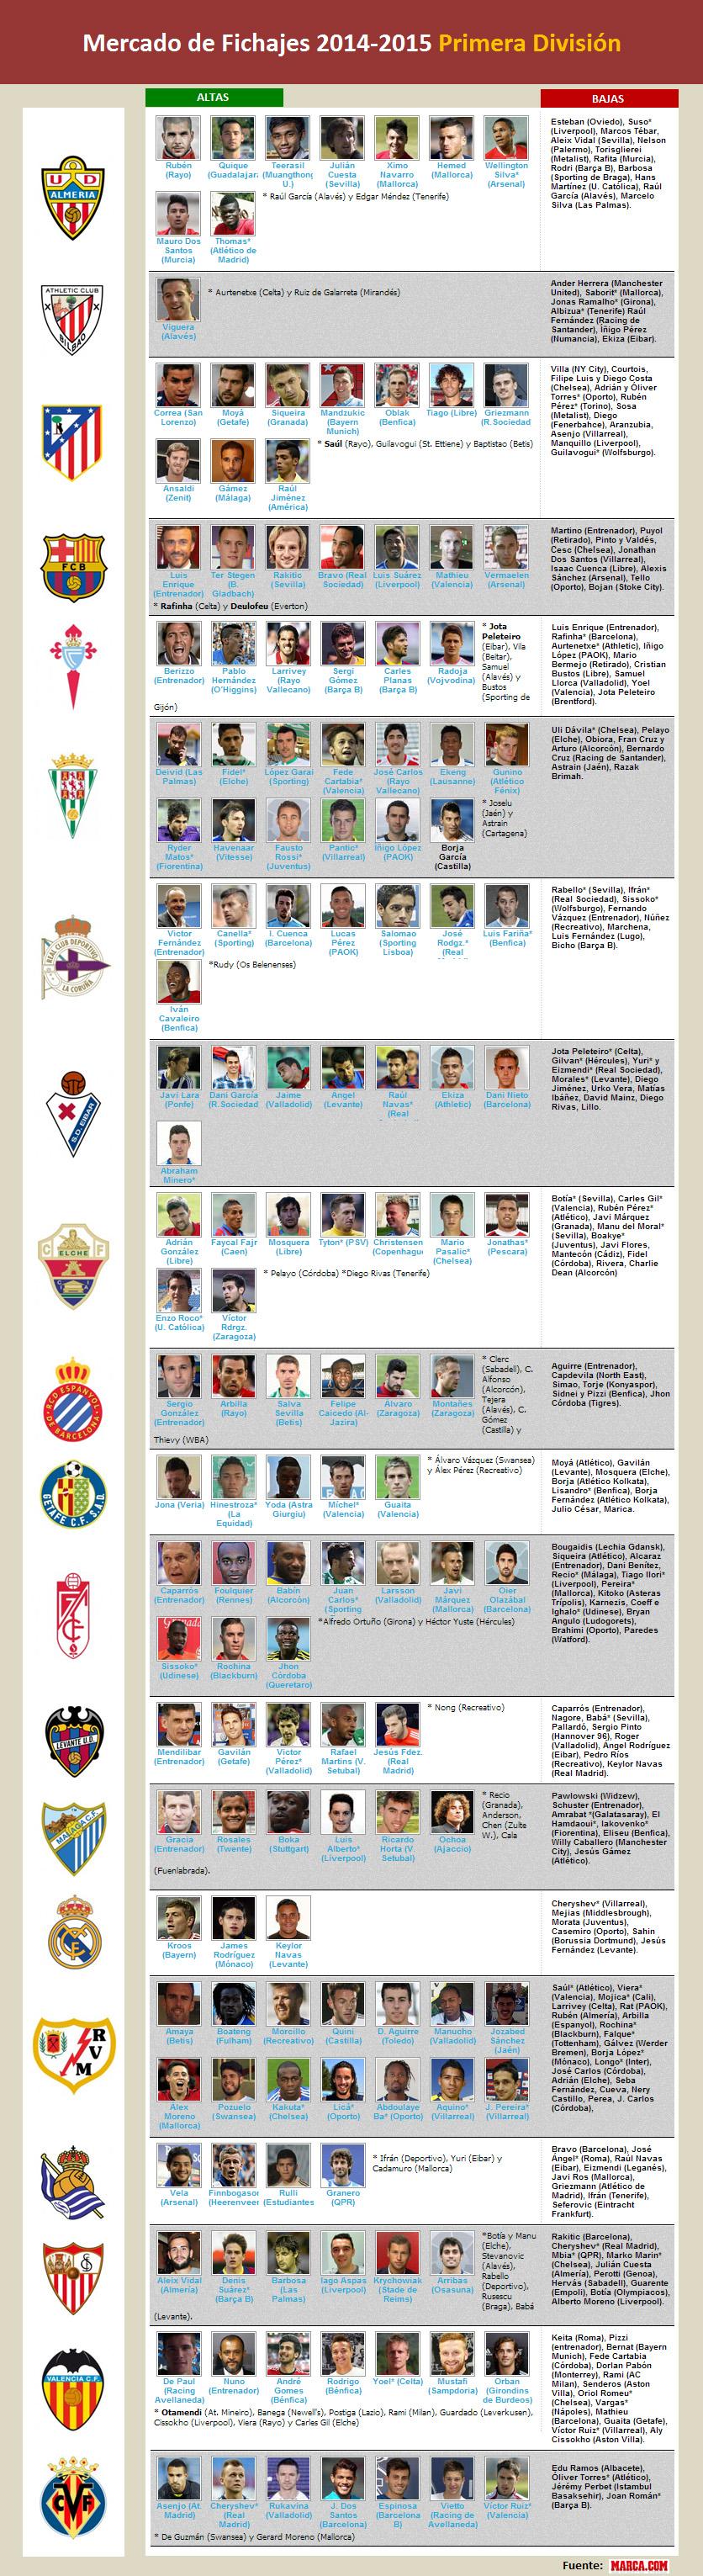 fichajes primera 2014-2015